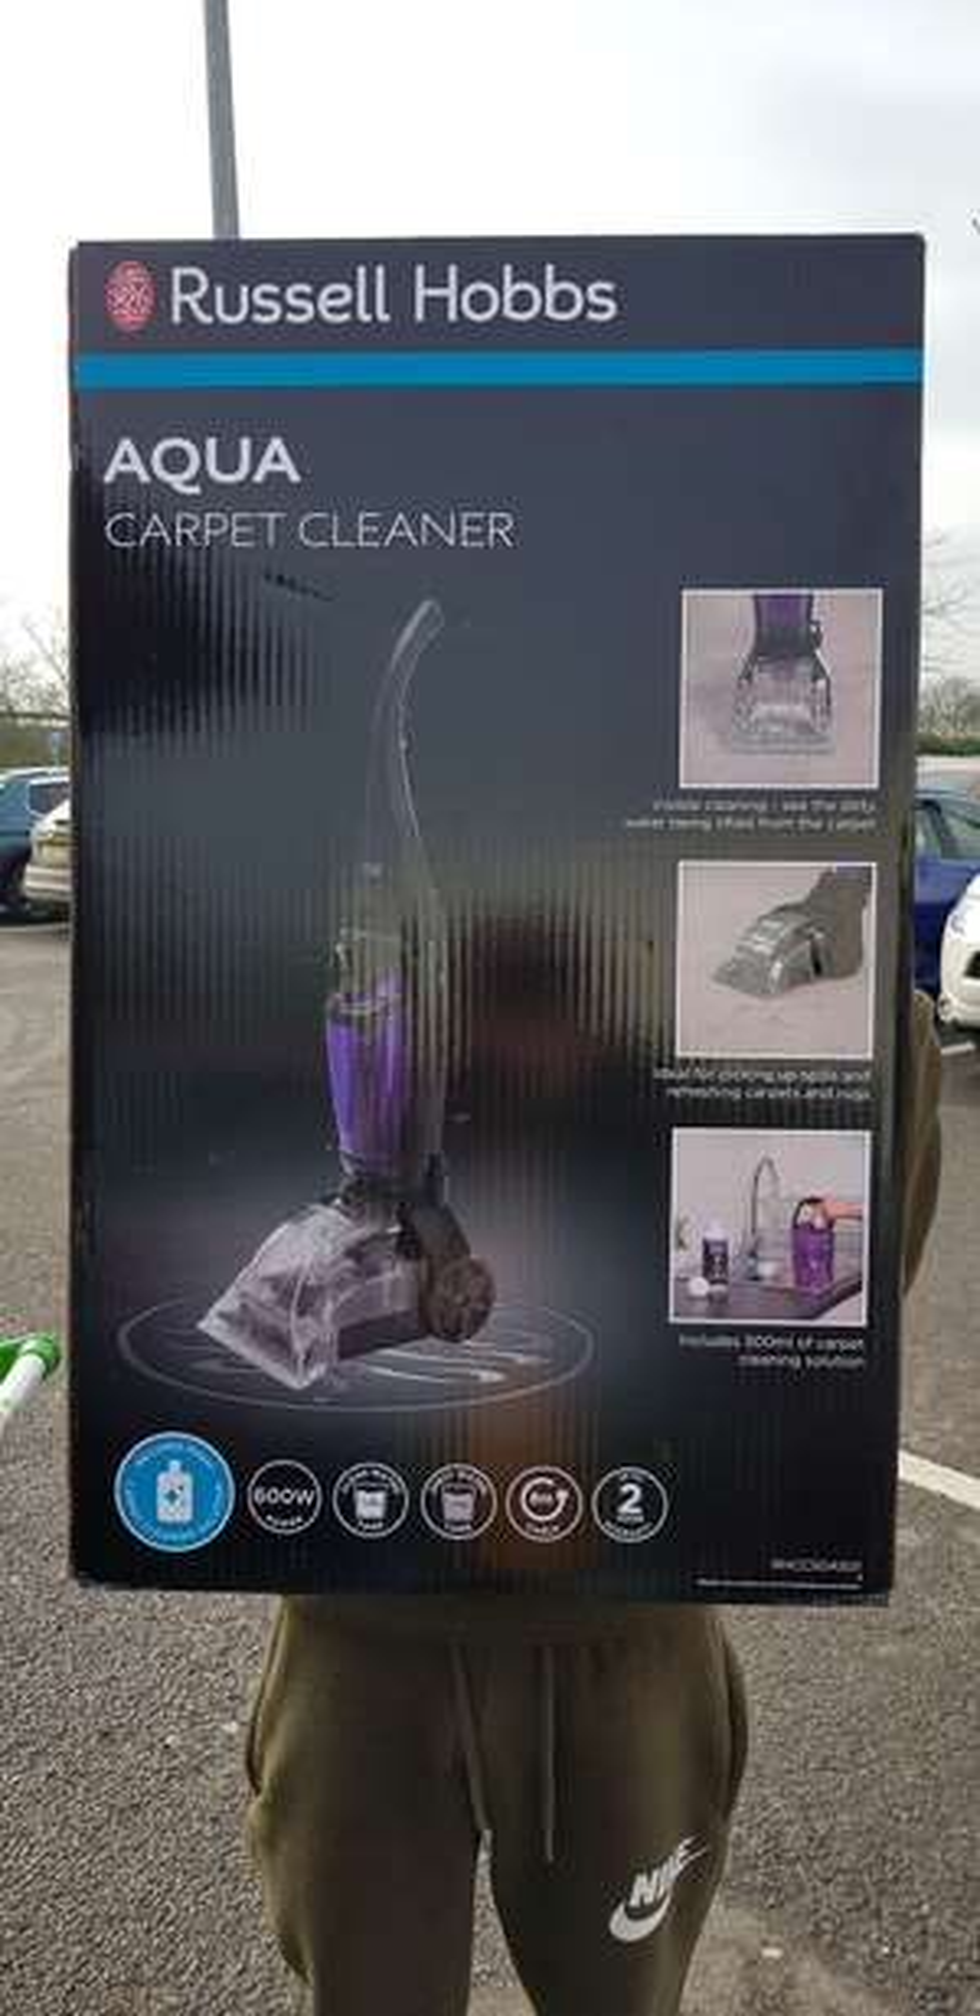 Russel Hobbs aqua carpet cleaner scanning at £58 in asda